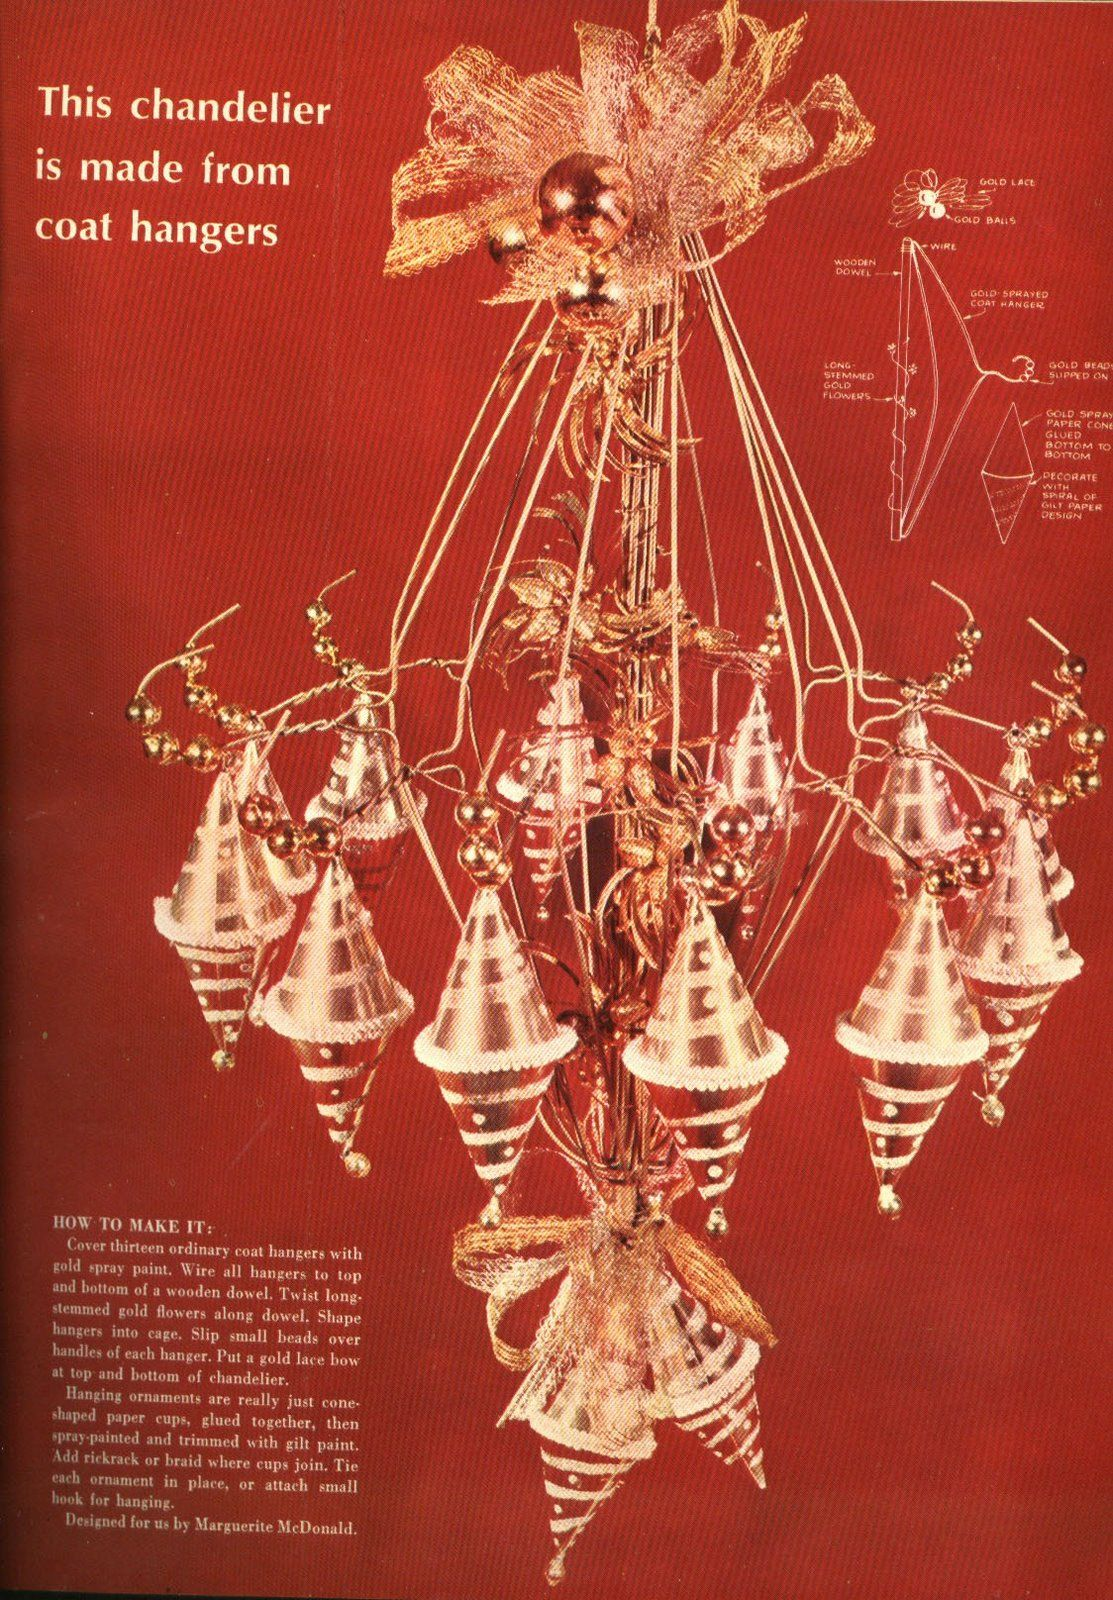 vintage wire hanger crafts - Google Search   Craft & DIY ...